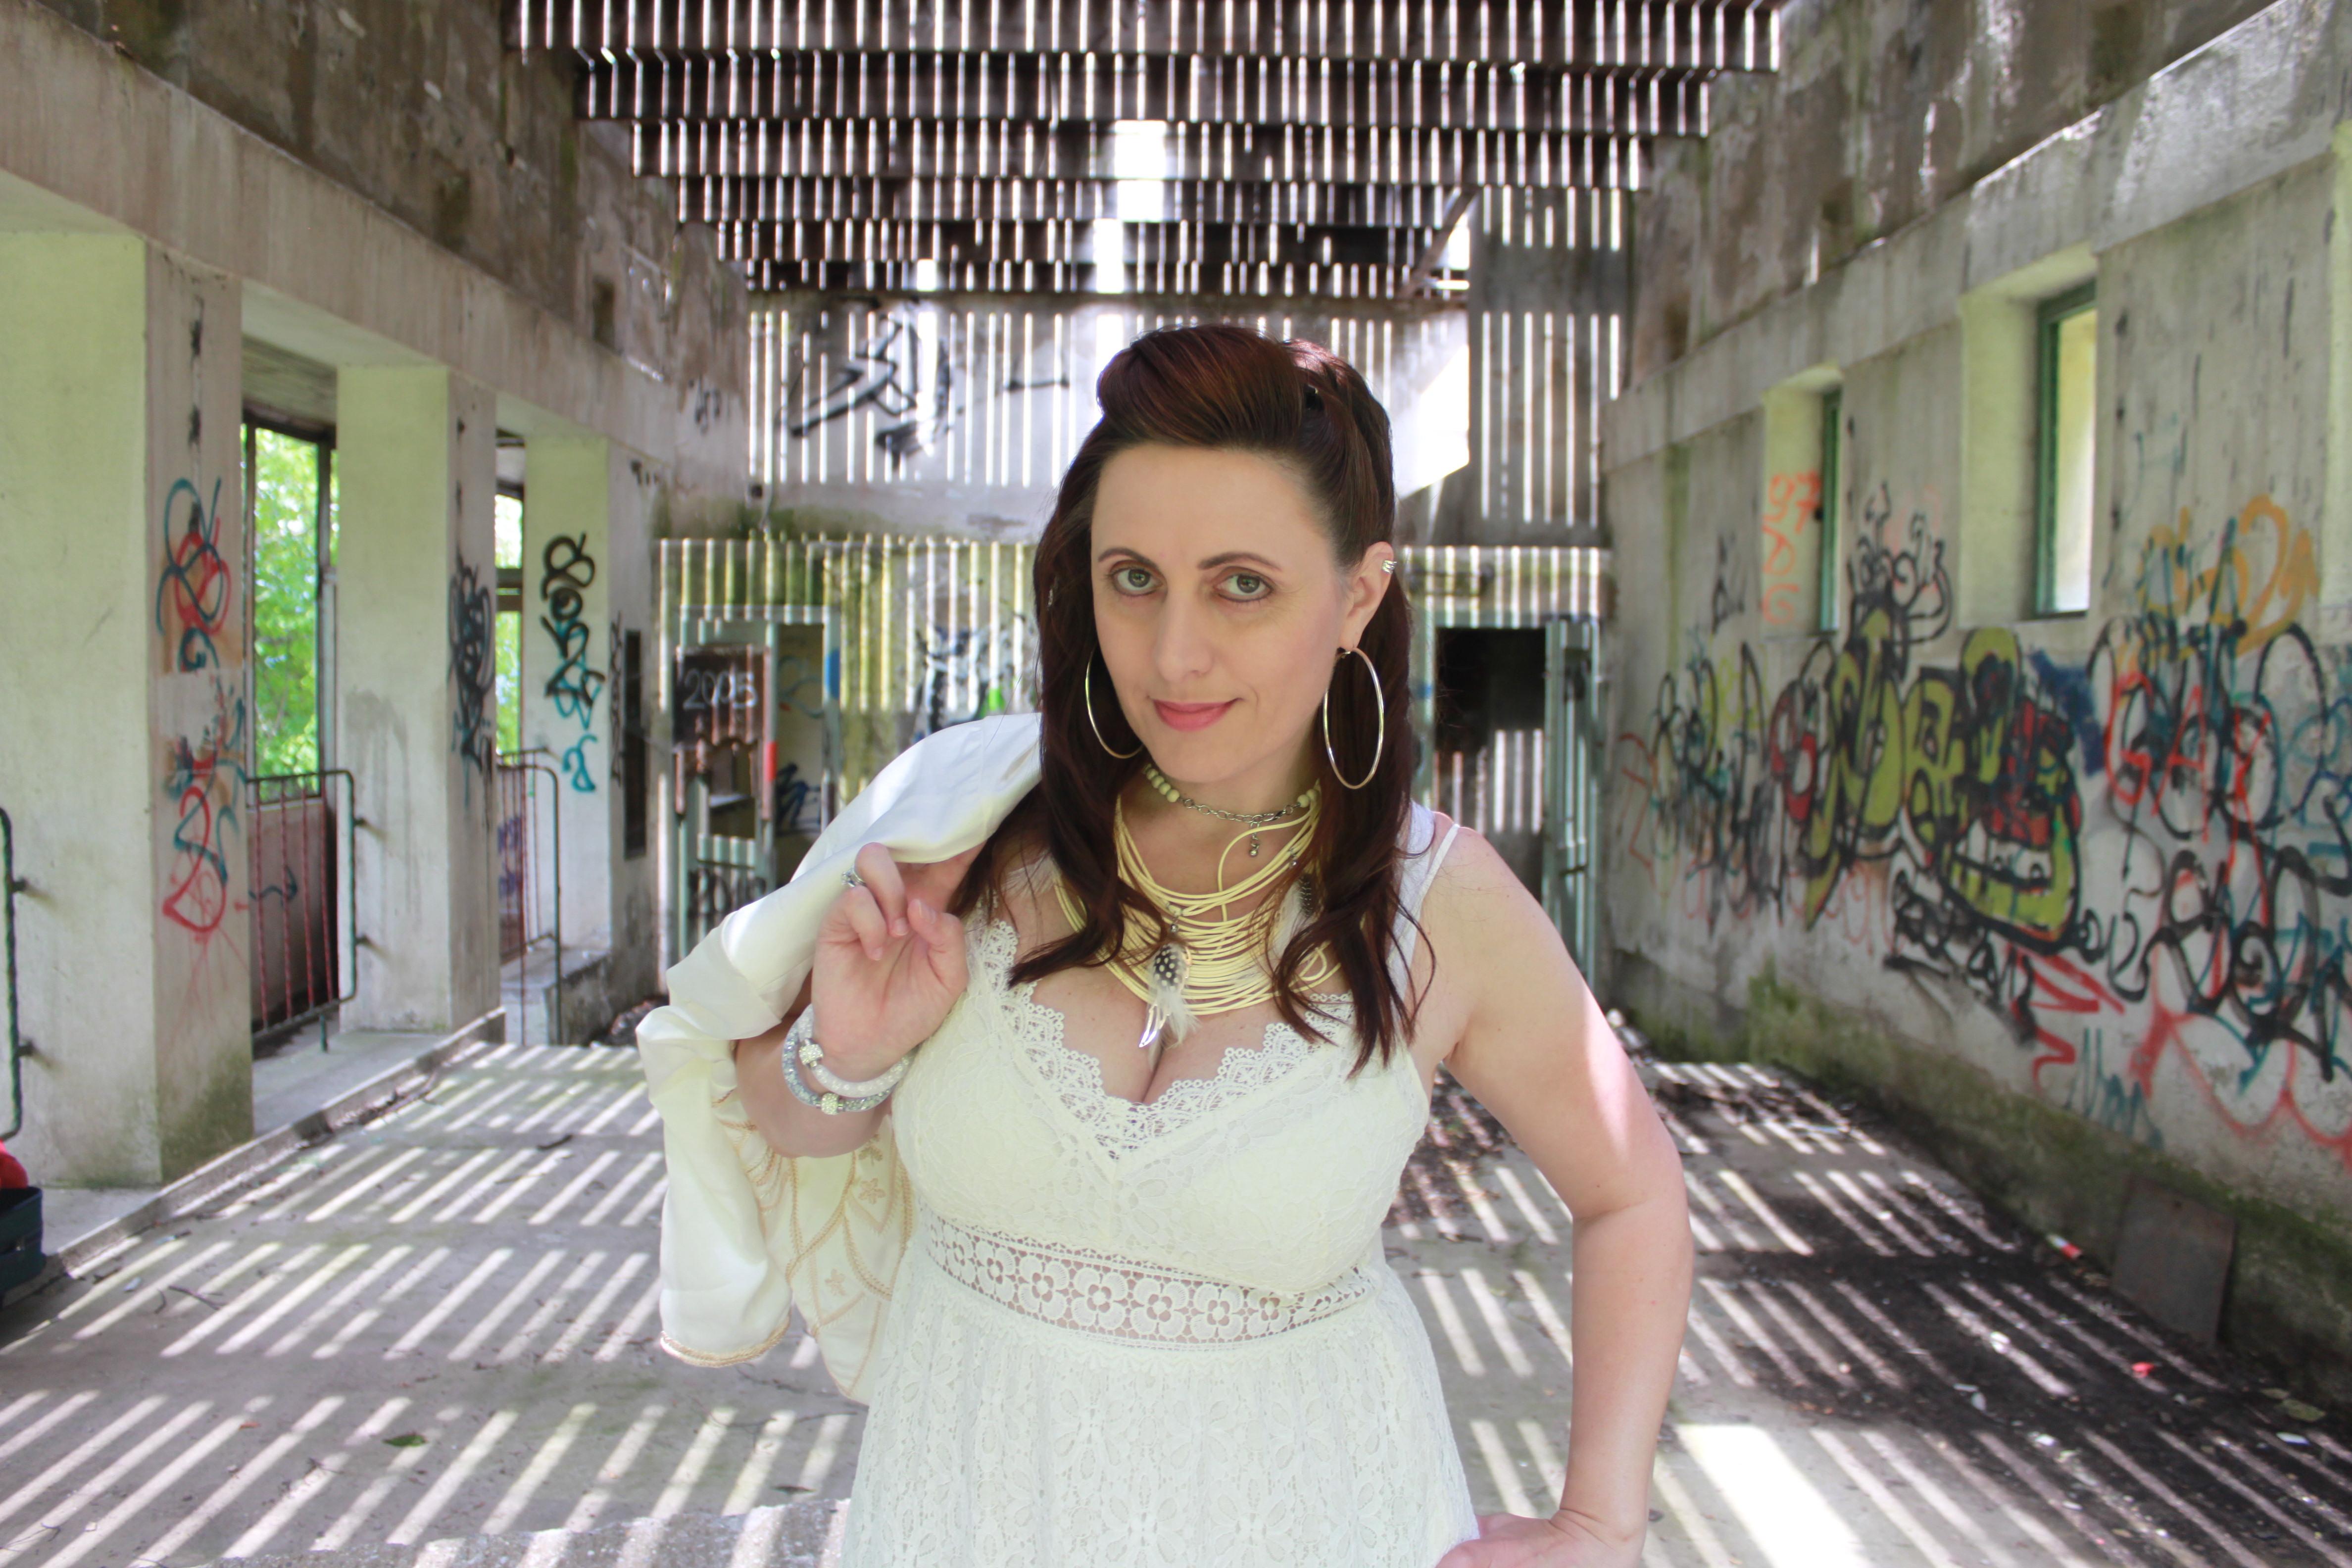 Tina Anders Gastauftritt beim Honky Tonk Festival in Villach!